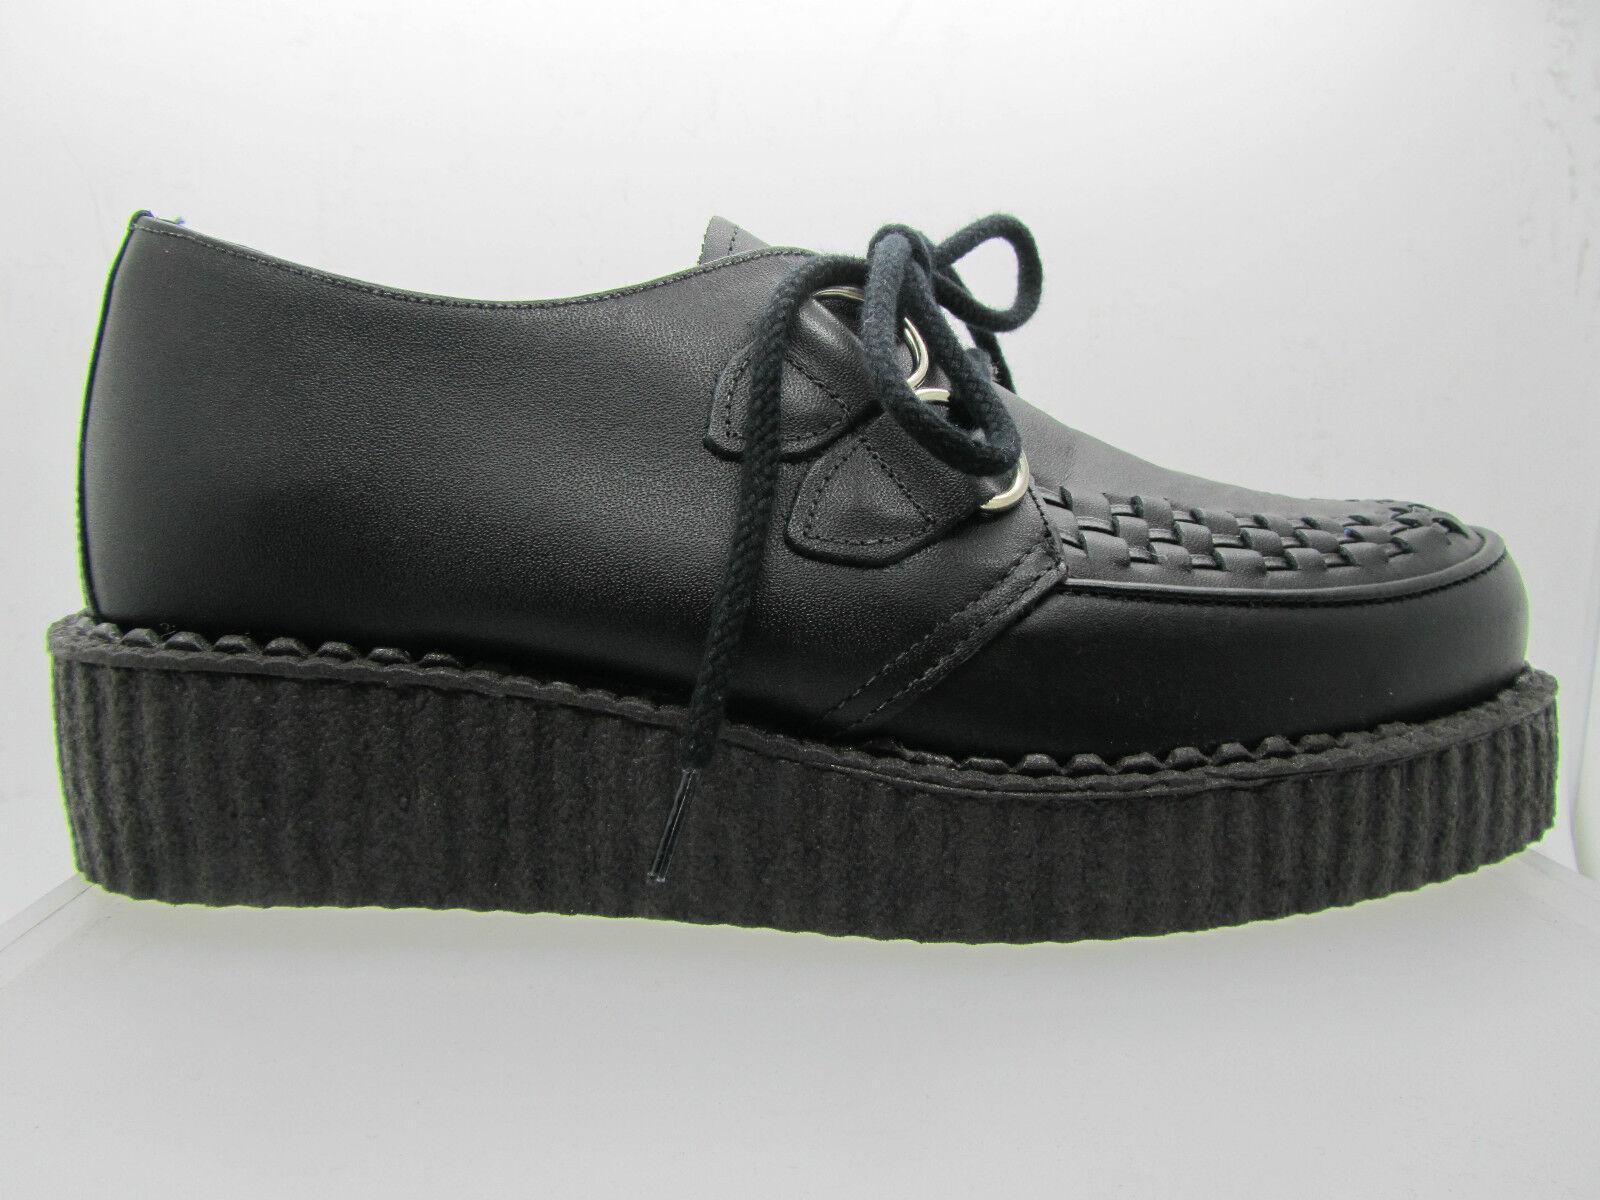 NEUF Rare Rétro Fait à la main UK Chaussures en cuir noir creepers rock punk goth fashions